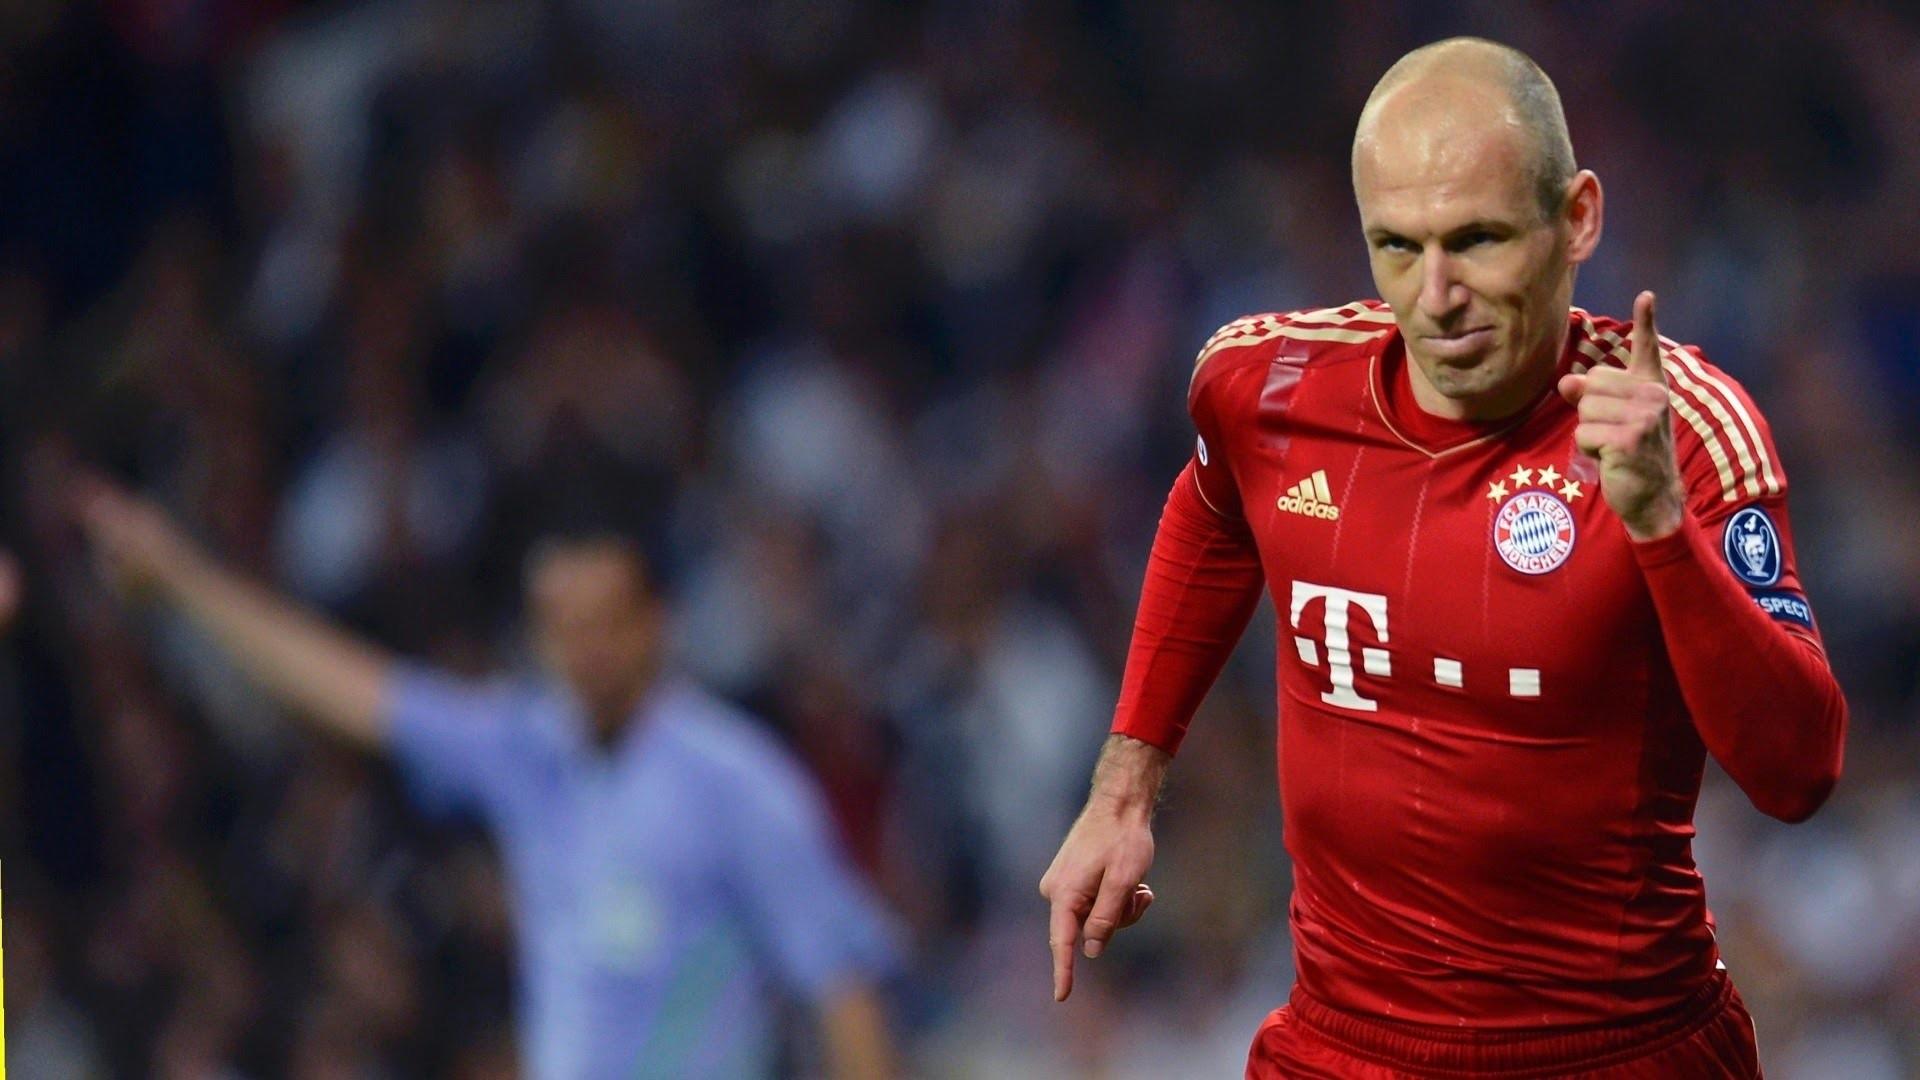 Bayern Munich 2015 [Champions League in War Torn Ukraine] – YouTube